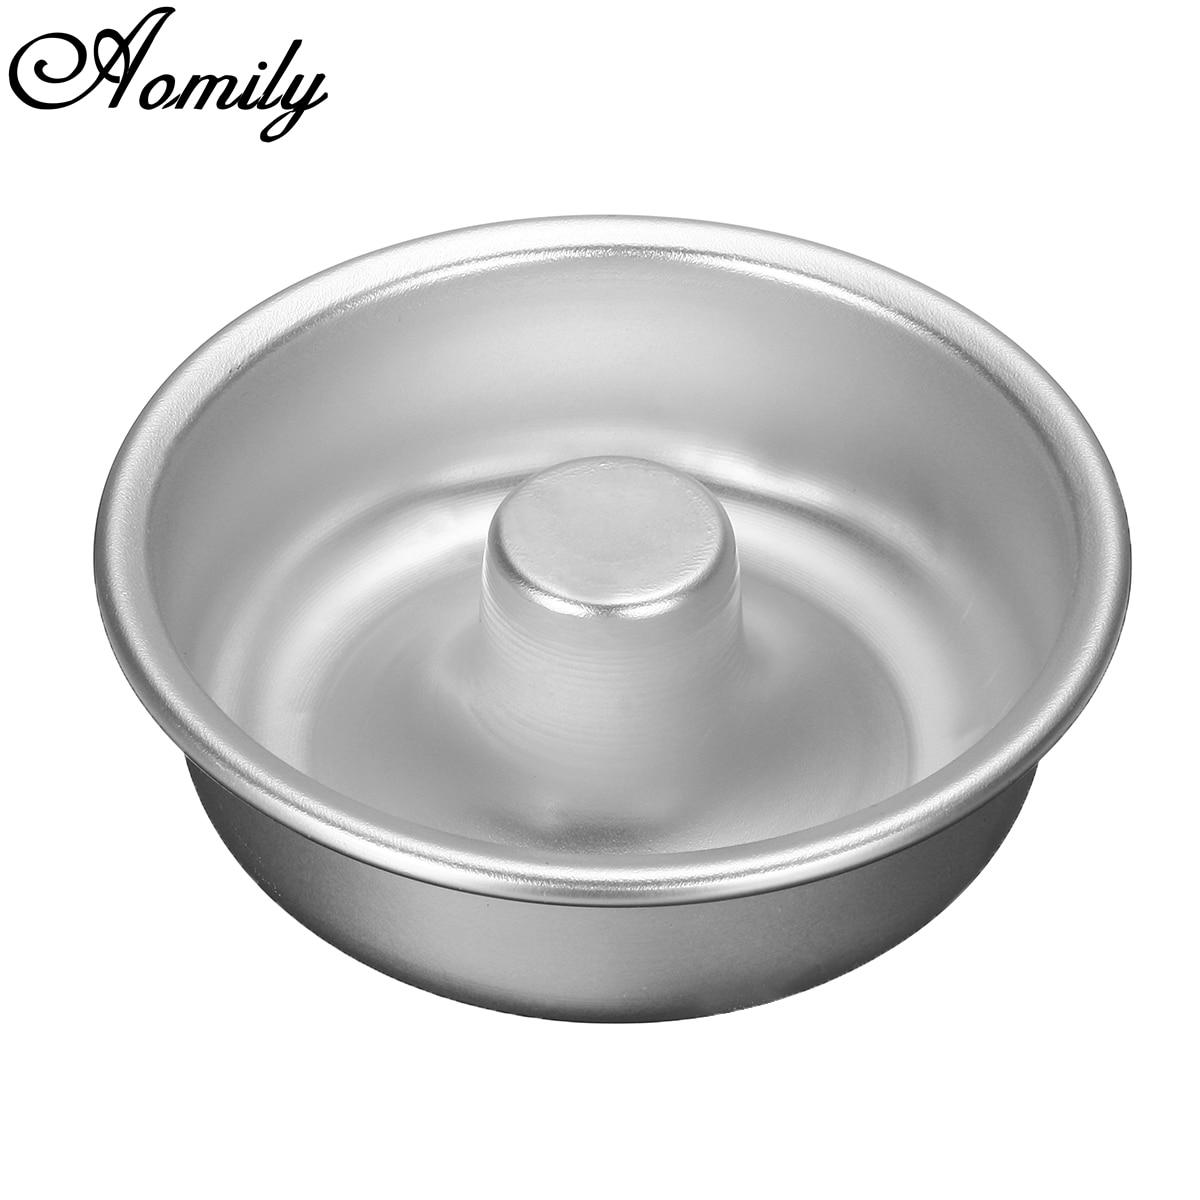 Aomily DIY Pudding Cake Mold Donut Pan Anodized Aluminum Alloy Mould Kitchen Bakery Baking Decoration Tin Ring Tools Bakeware